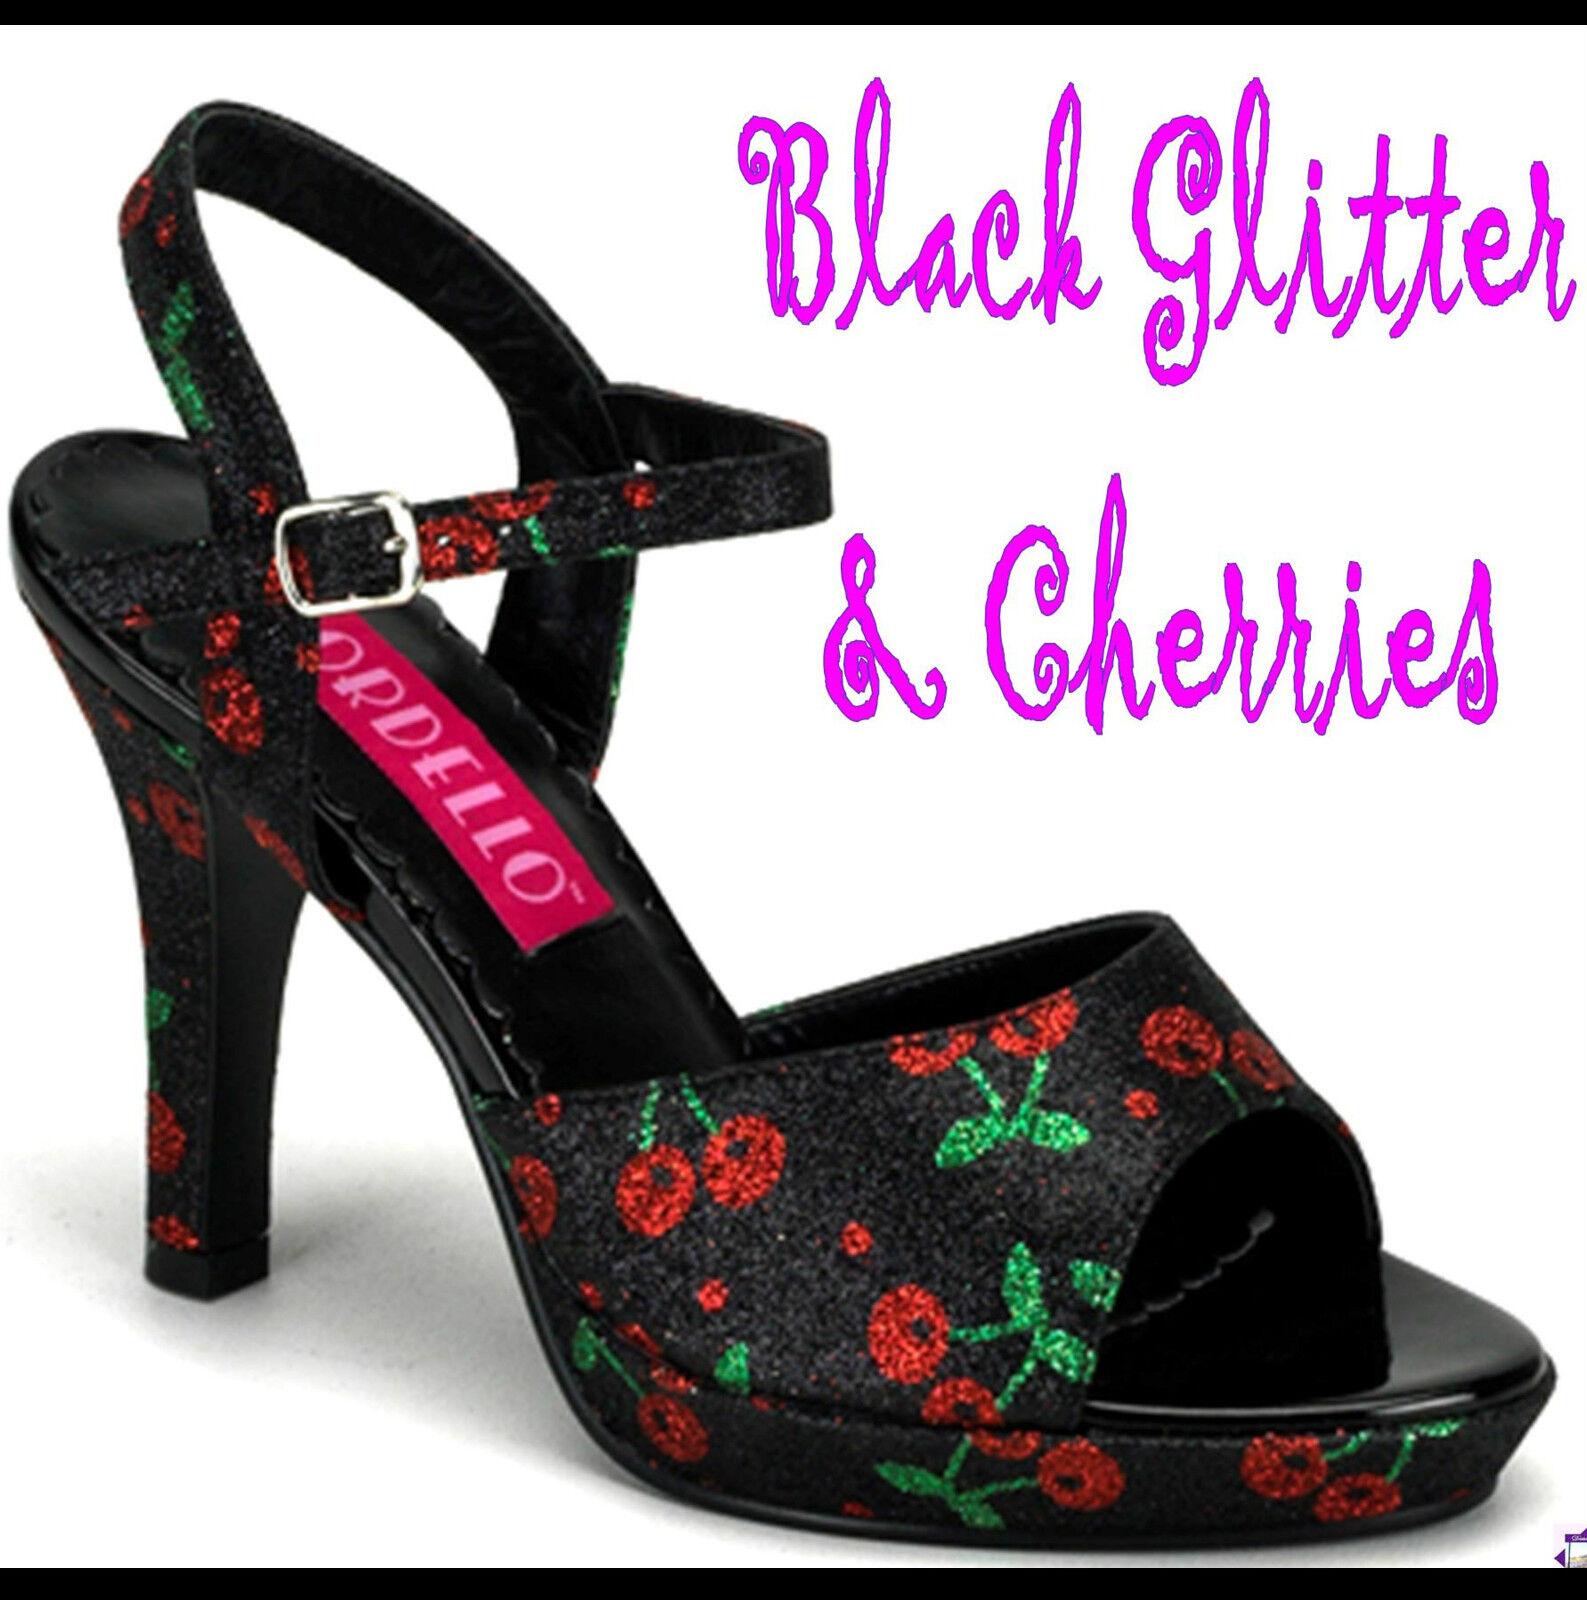 acquista marca AMUSE-05G nero GLITTER GLITTER GLITTER & CHERRIES .75  Mini Platform 4  Heel Sandals 8US=7AU  più preferenziale